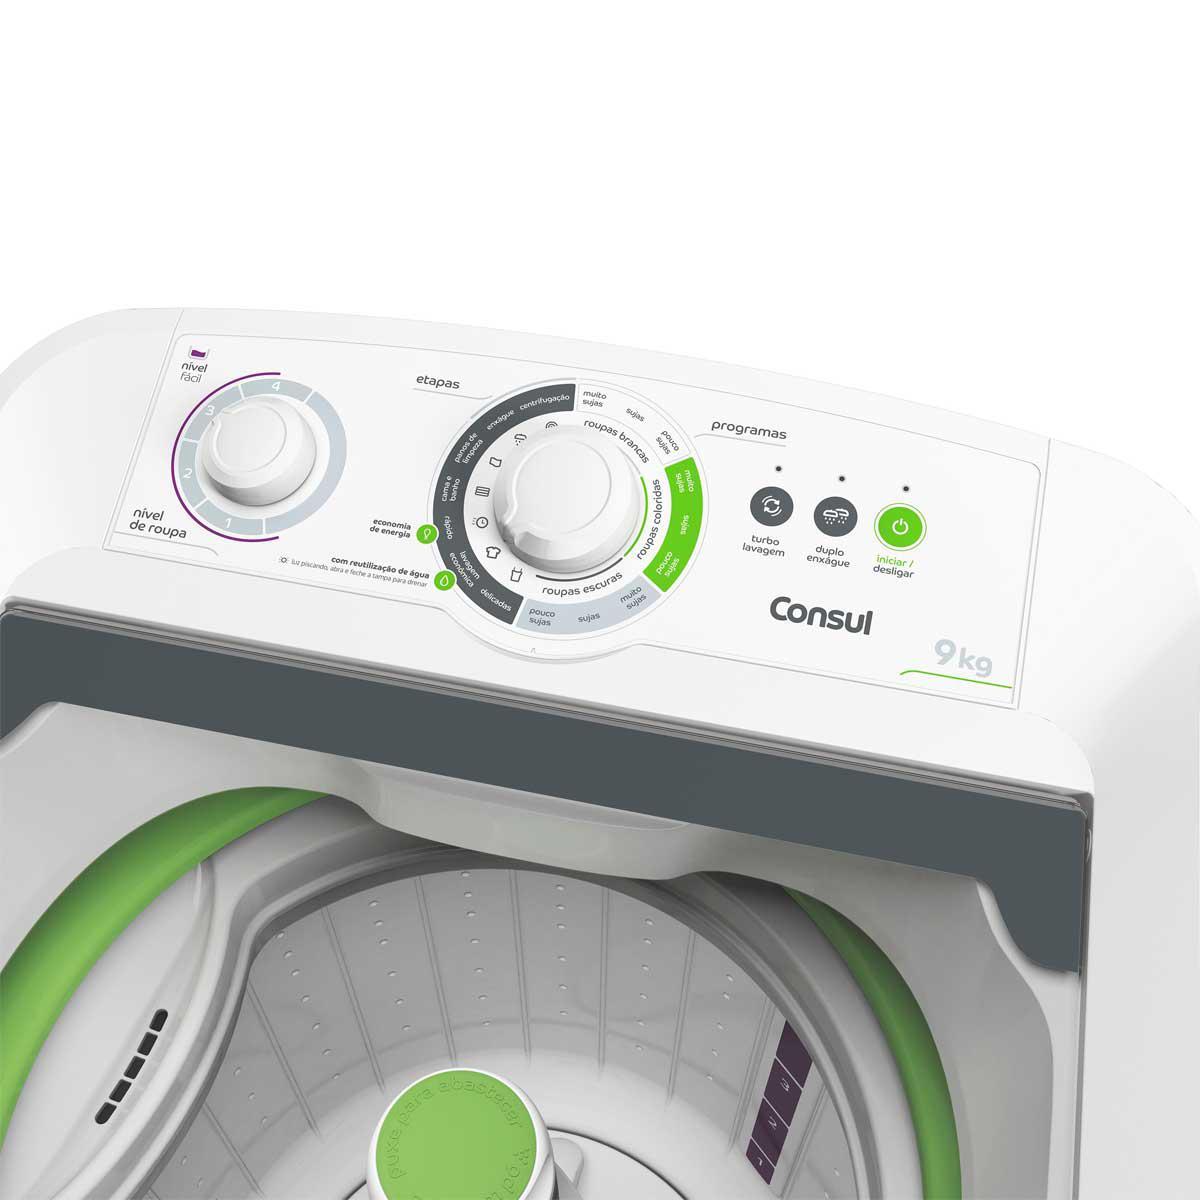 lavadora de roupas 9kg consul cwe09ab m quina lavadora. Black Bedroom Furniture Sets. Home Design Ideas